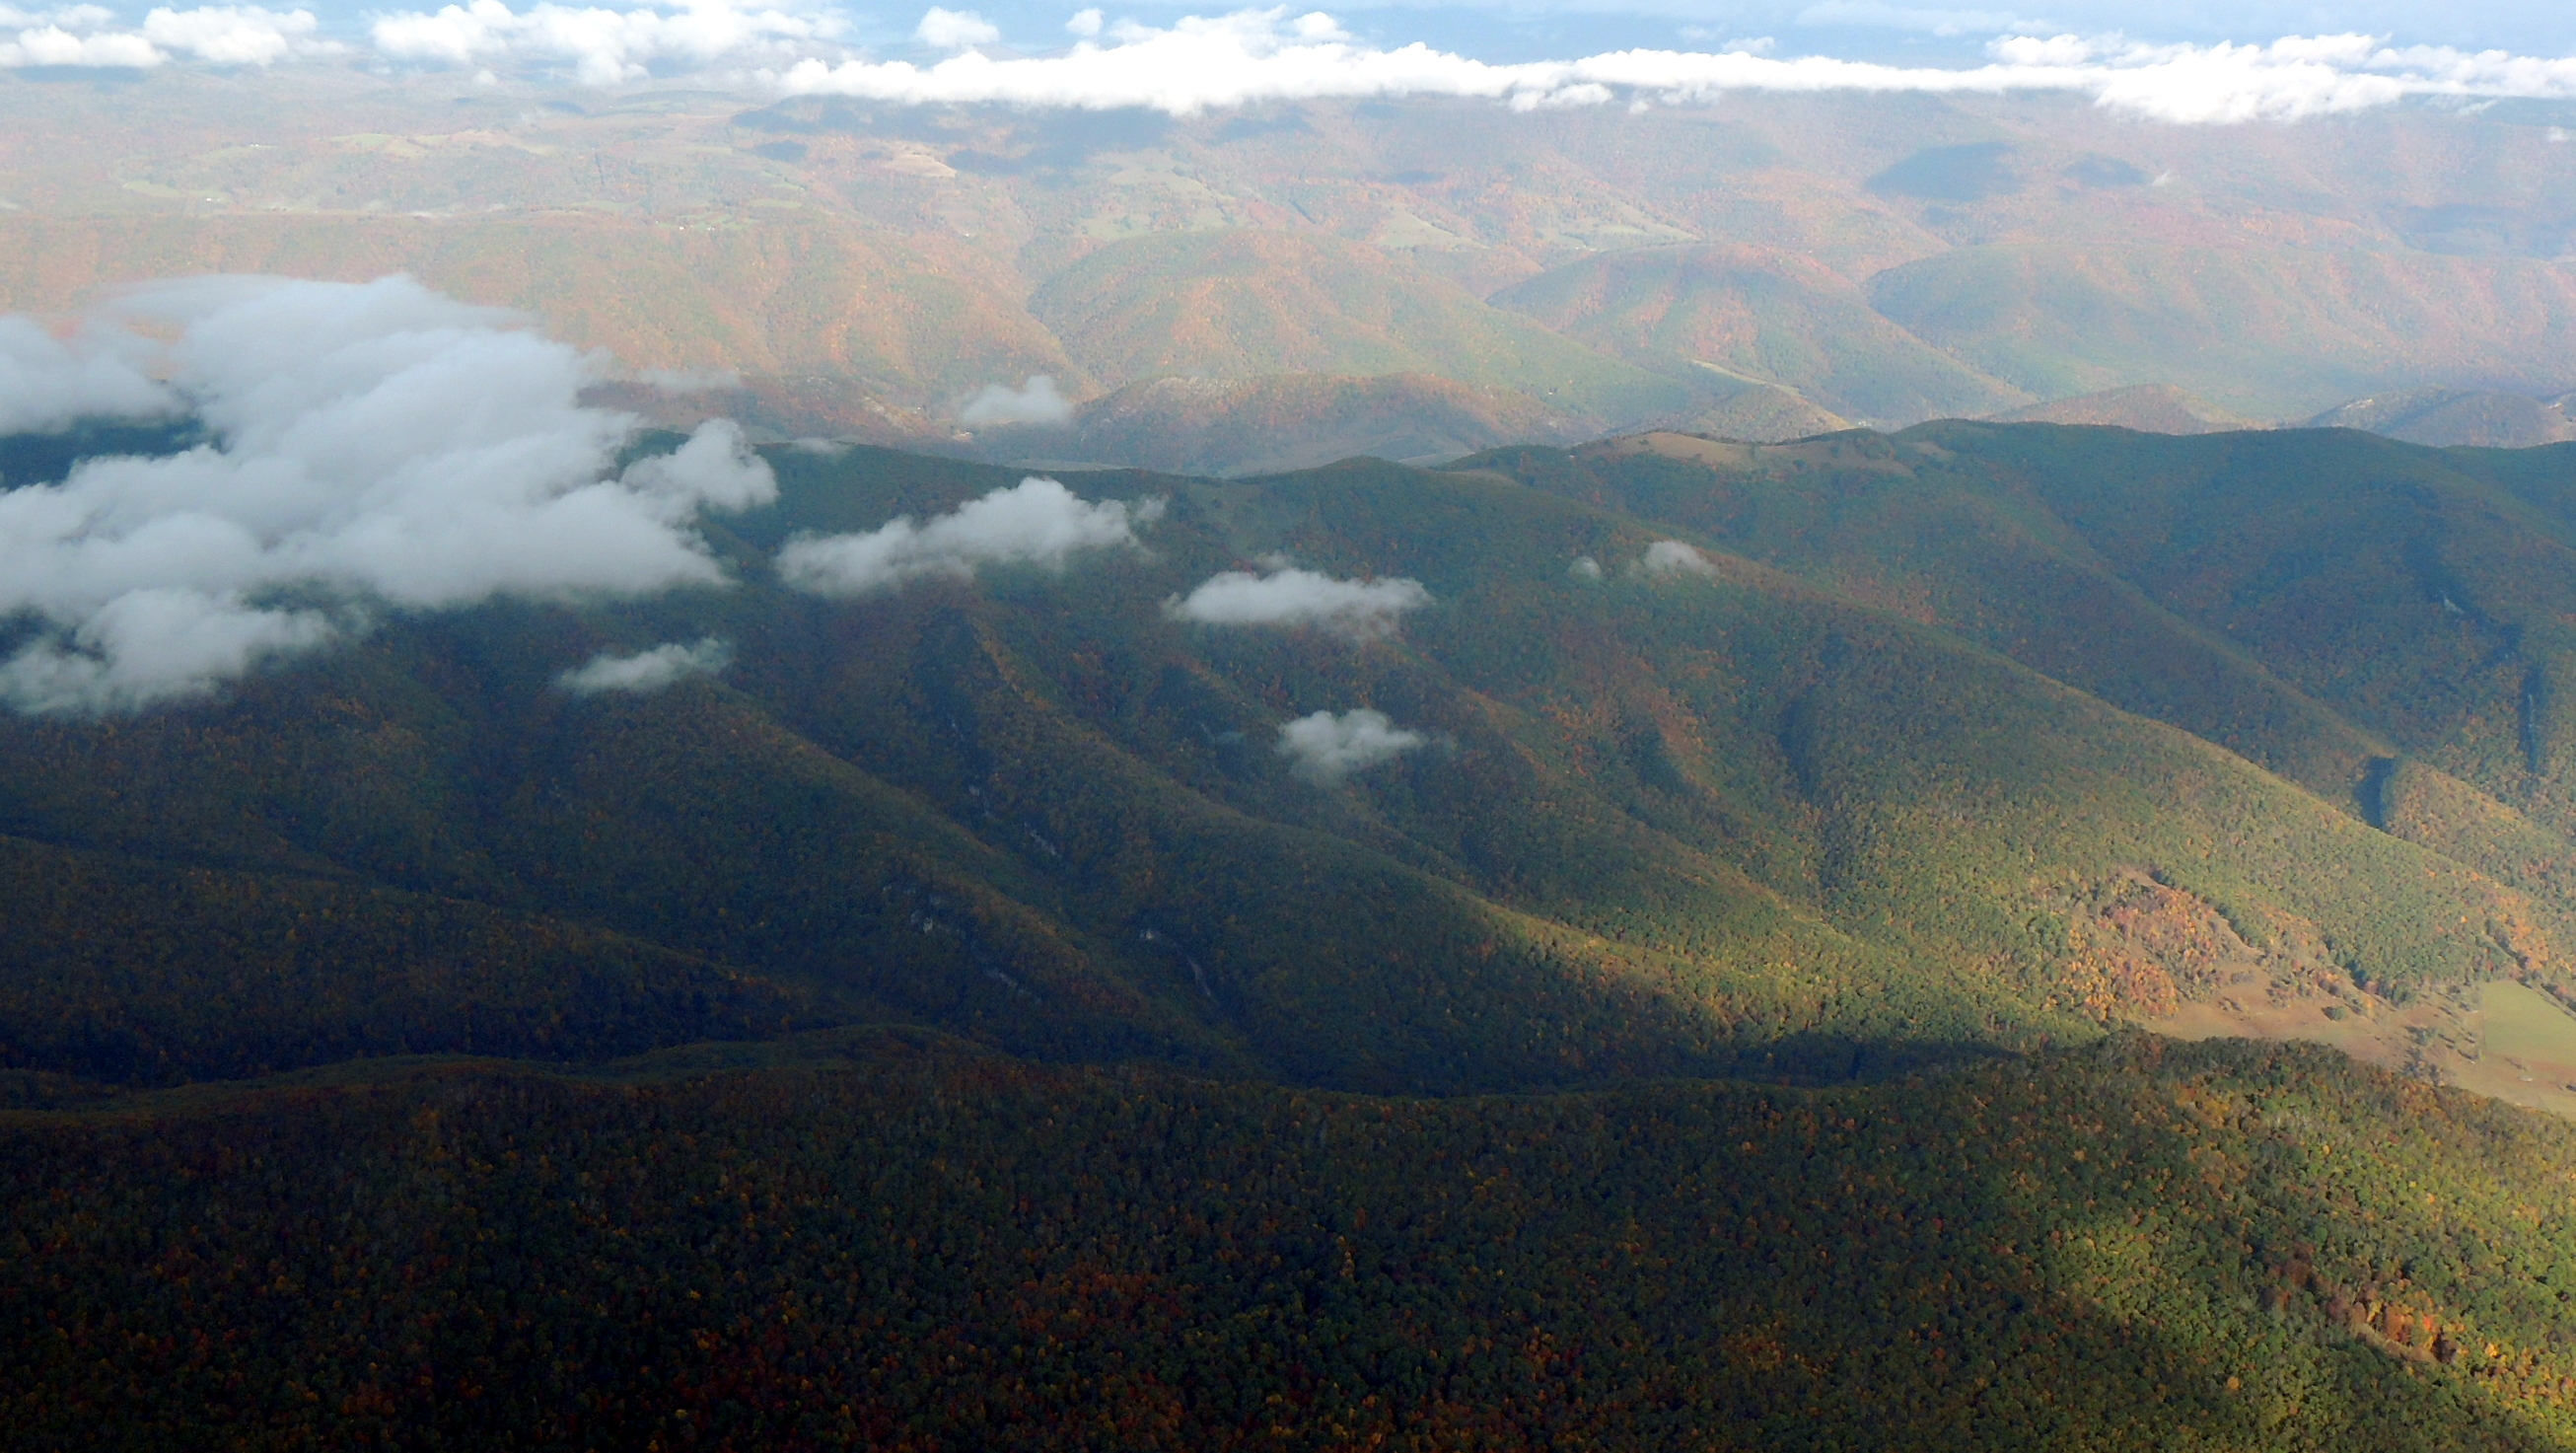 Heading over the Appalachian Mountains on our way to Cincinnati Ohio